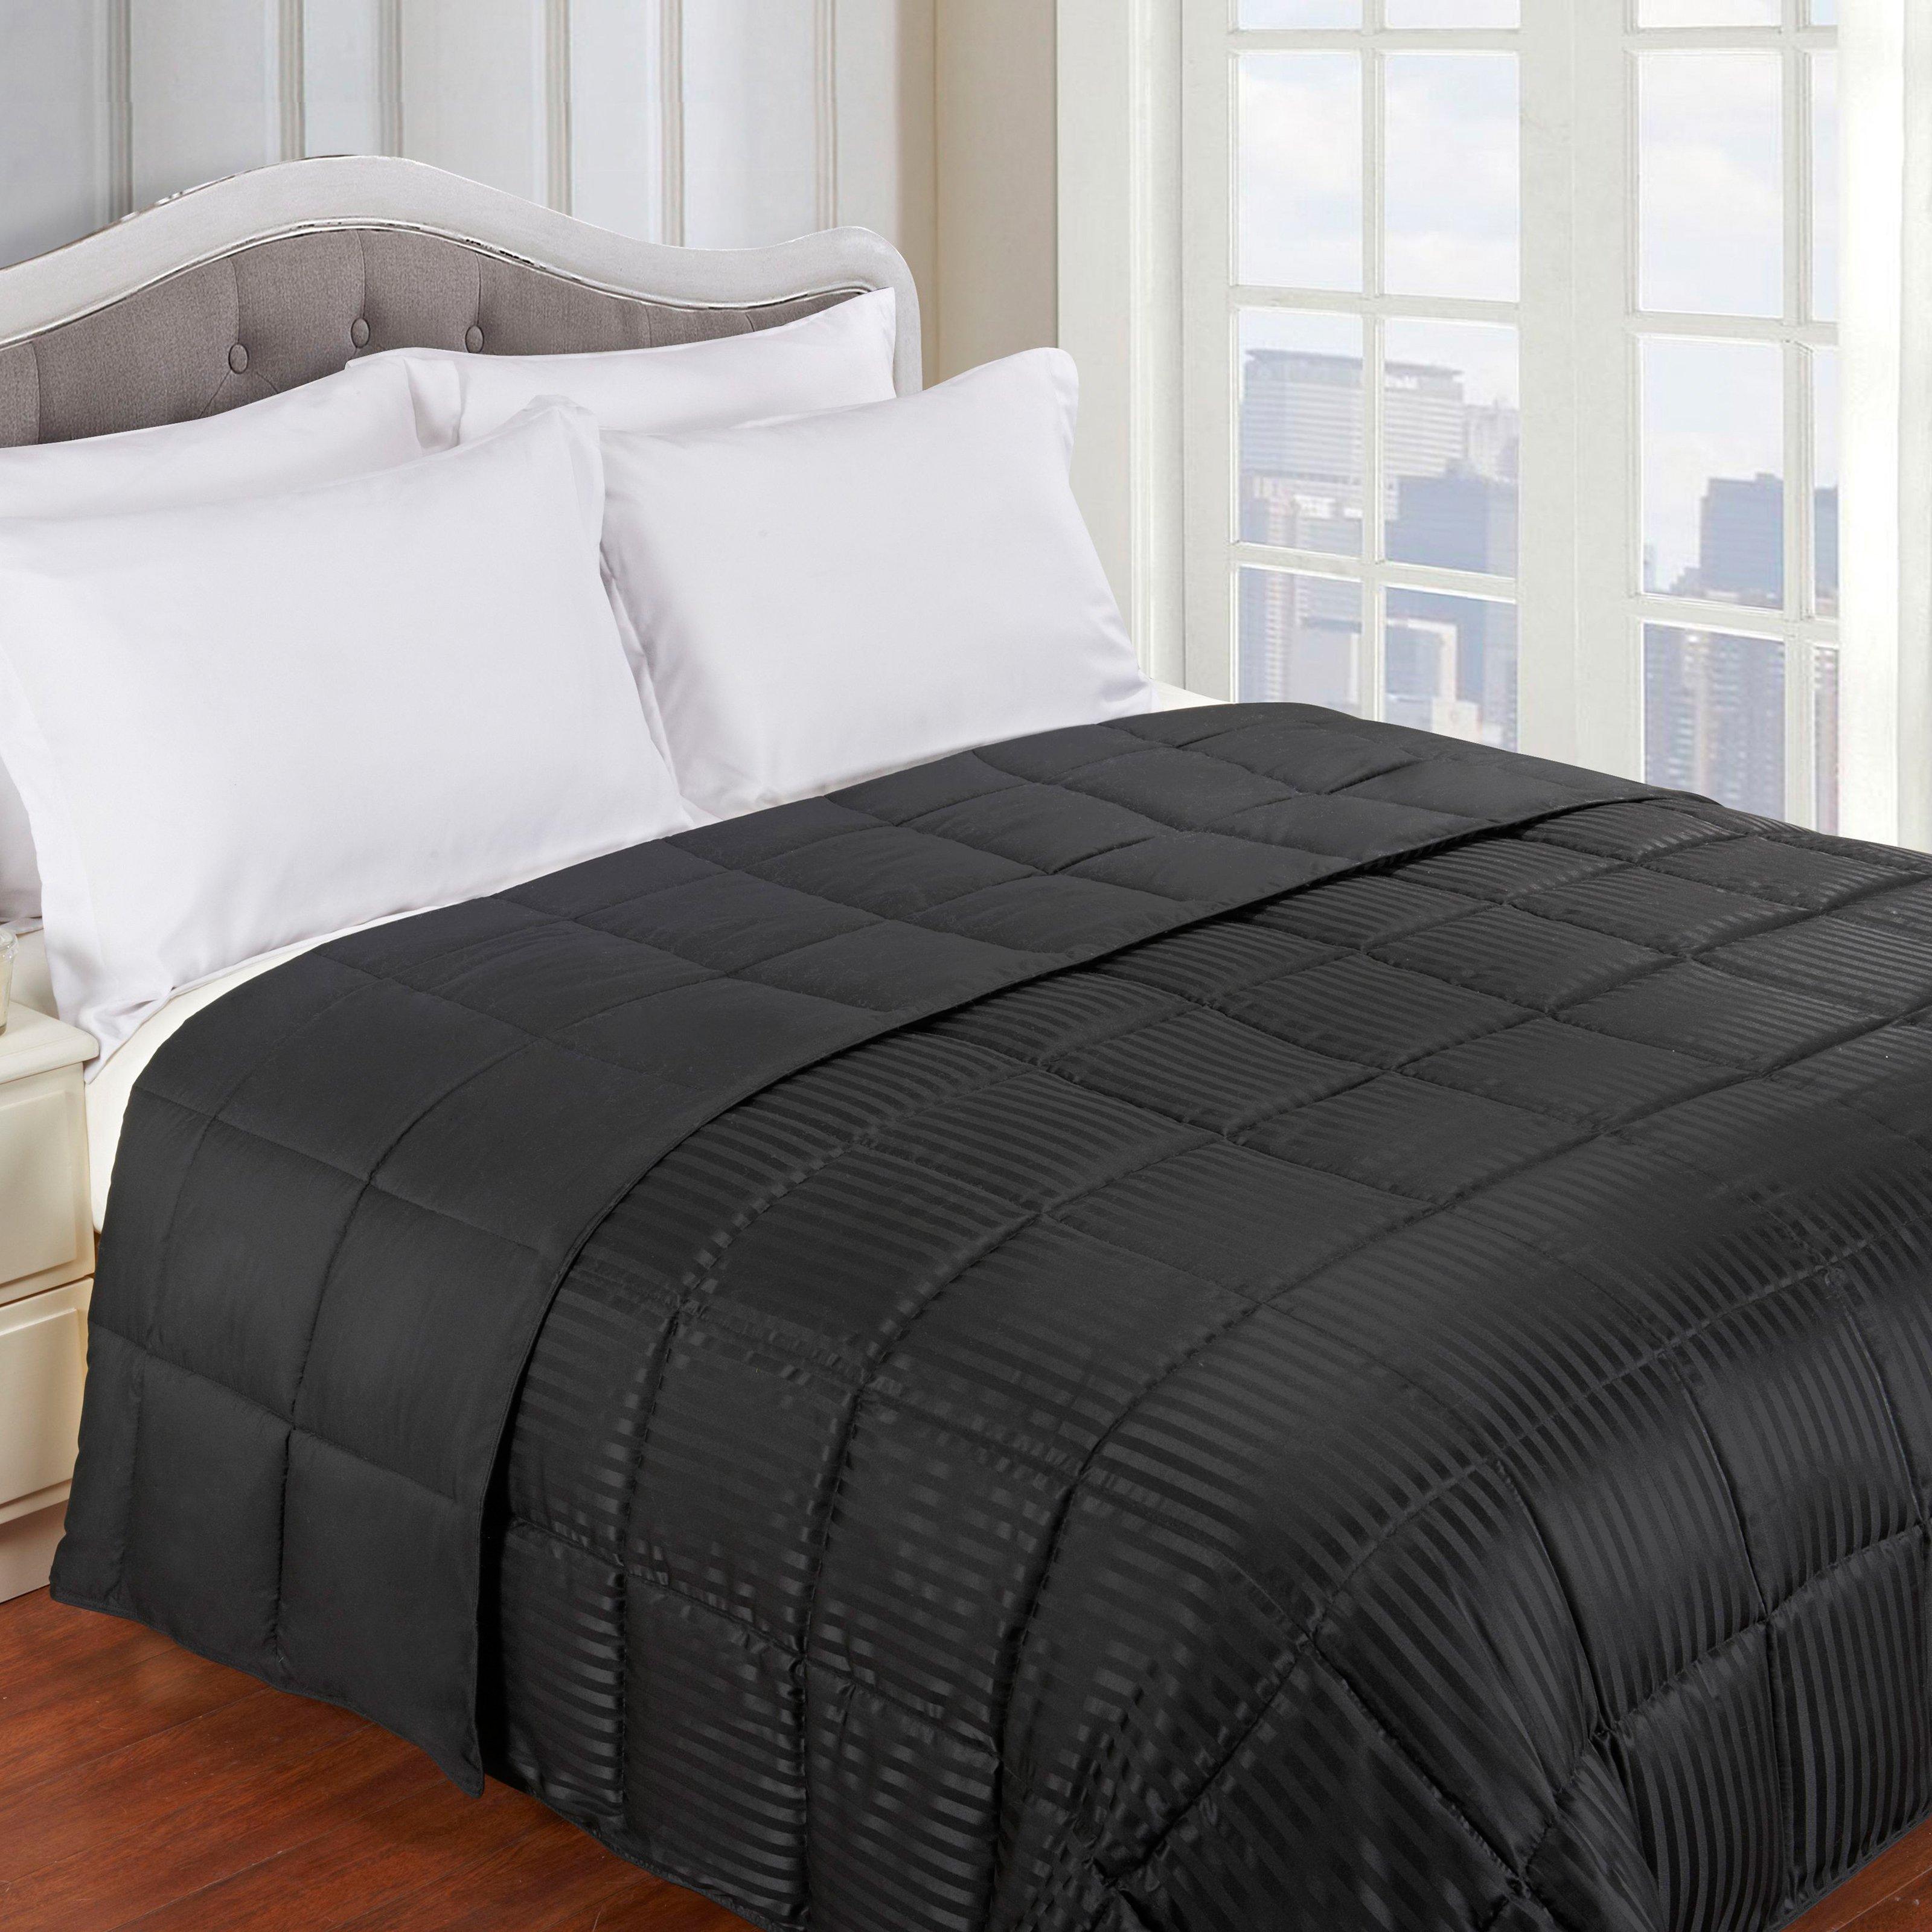 Superior All-Season Down Alternative Reversible Blanket